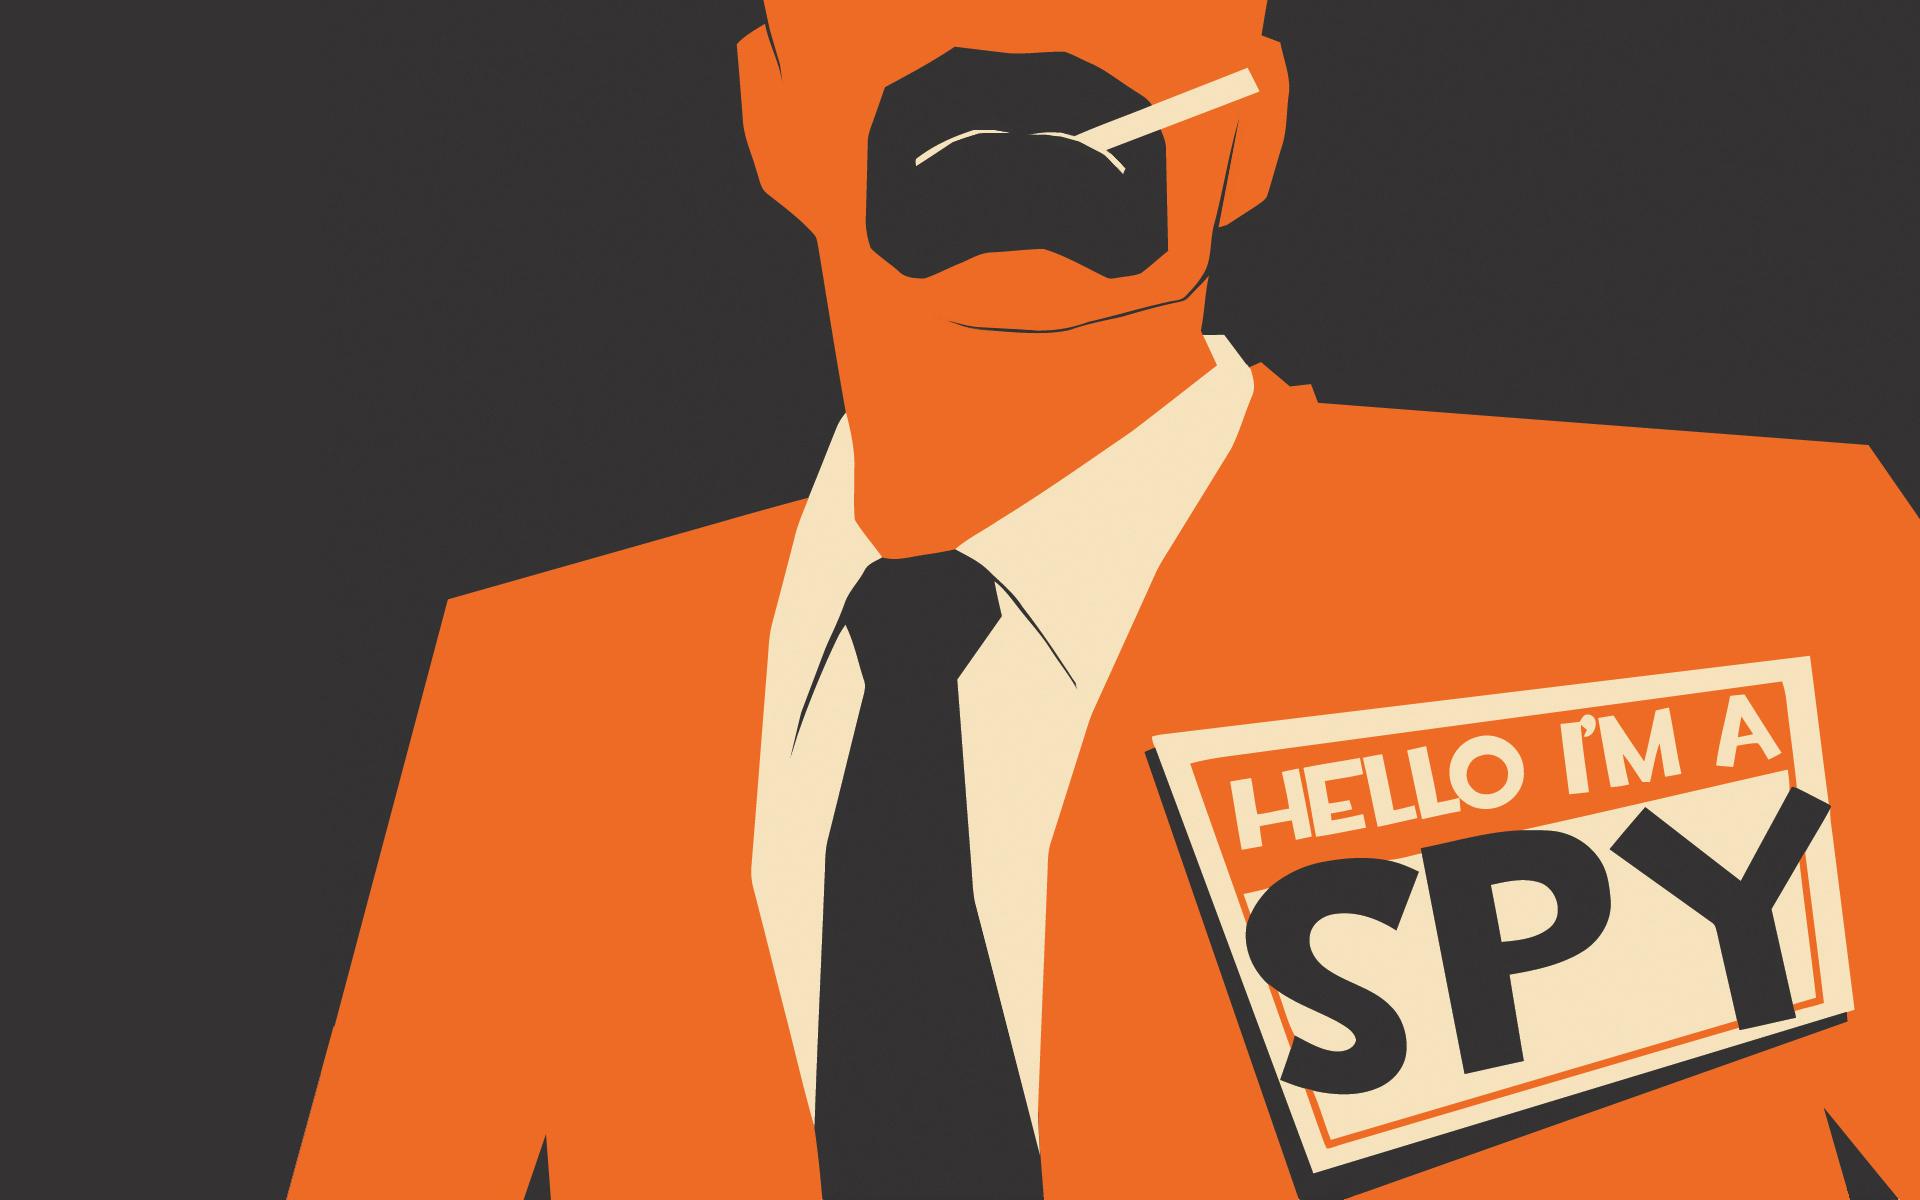 tf2 meet the spy hd sunglasses